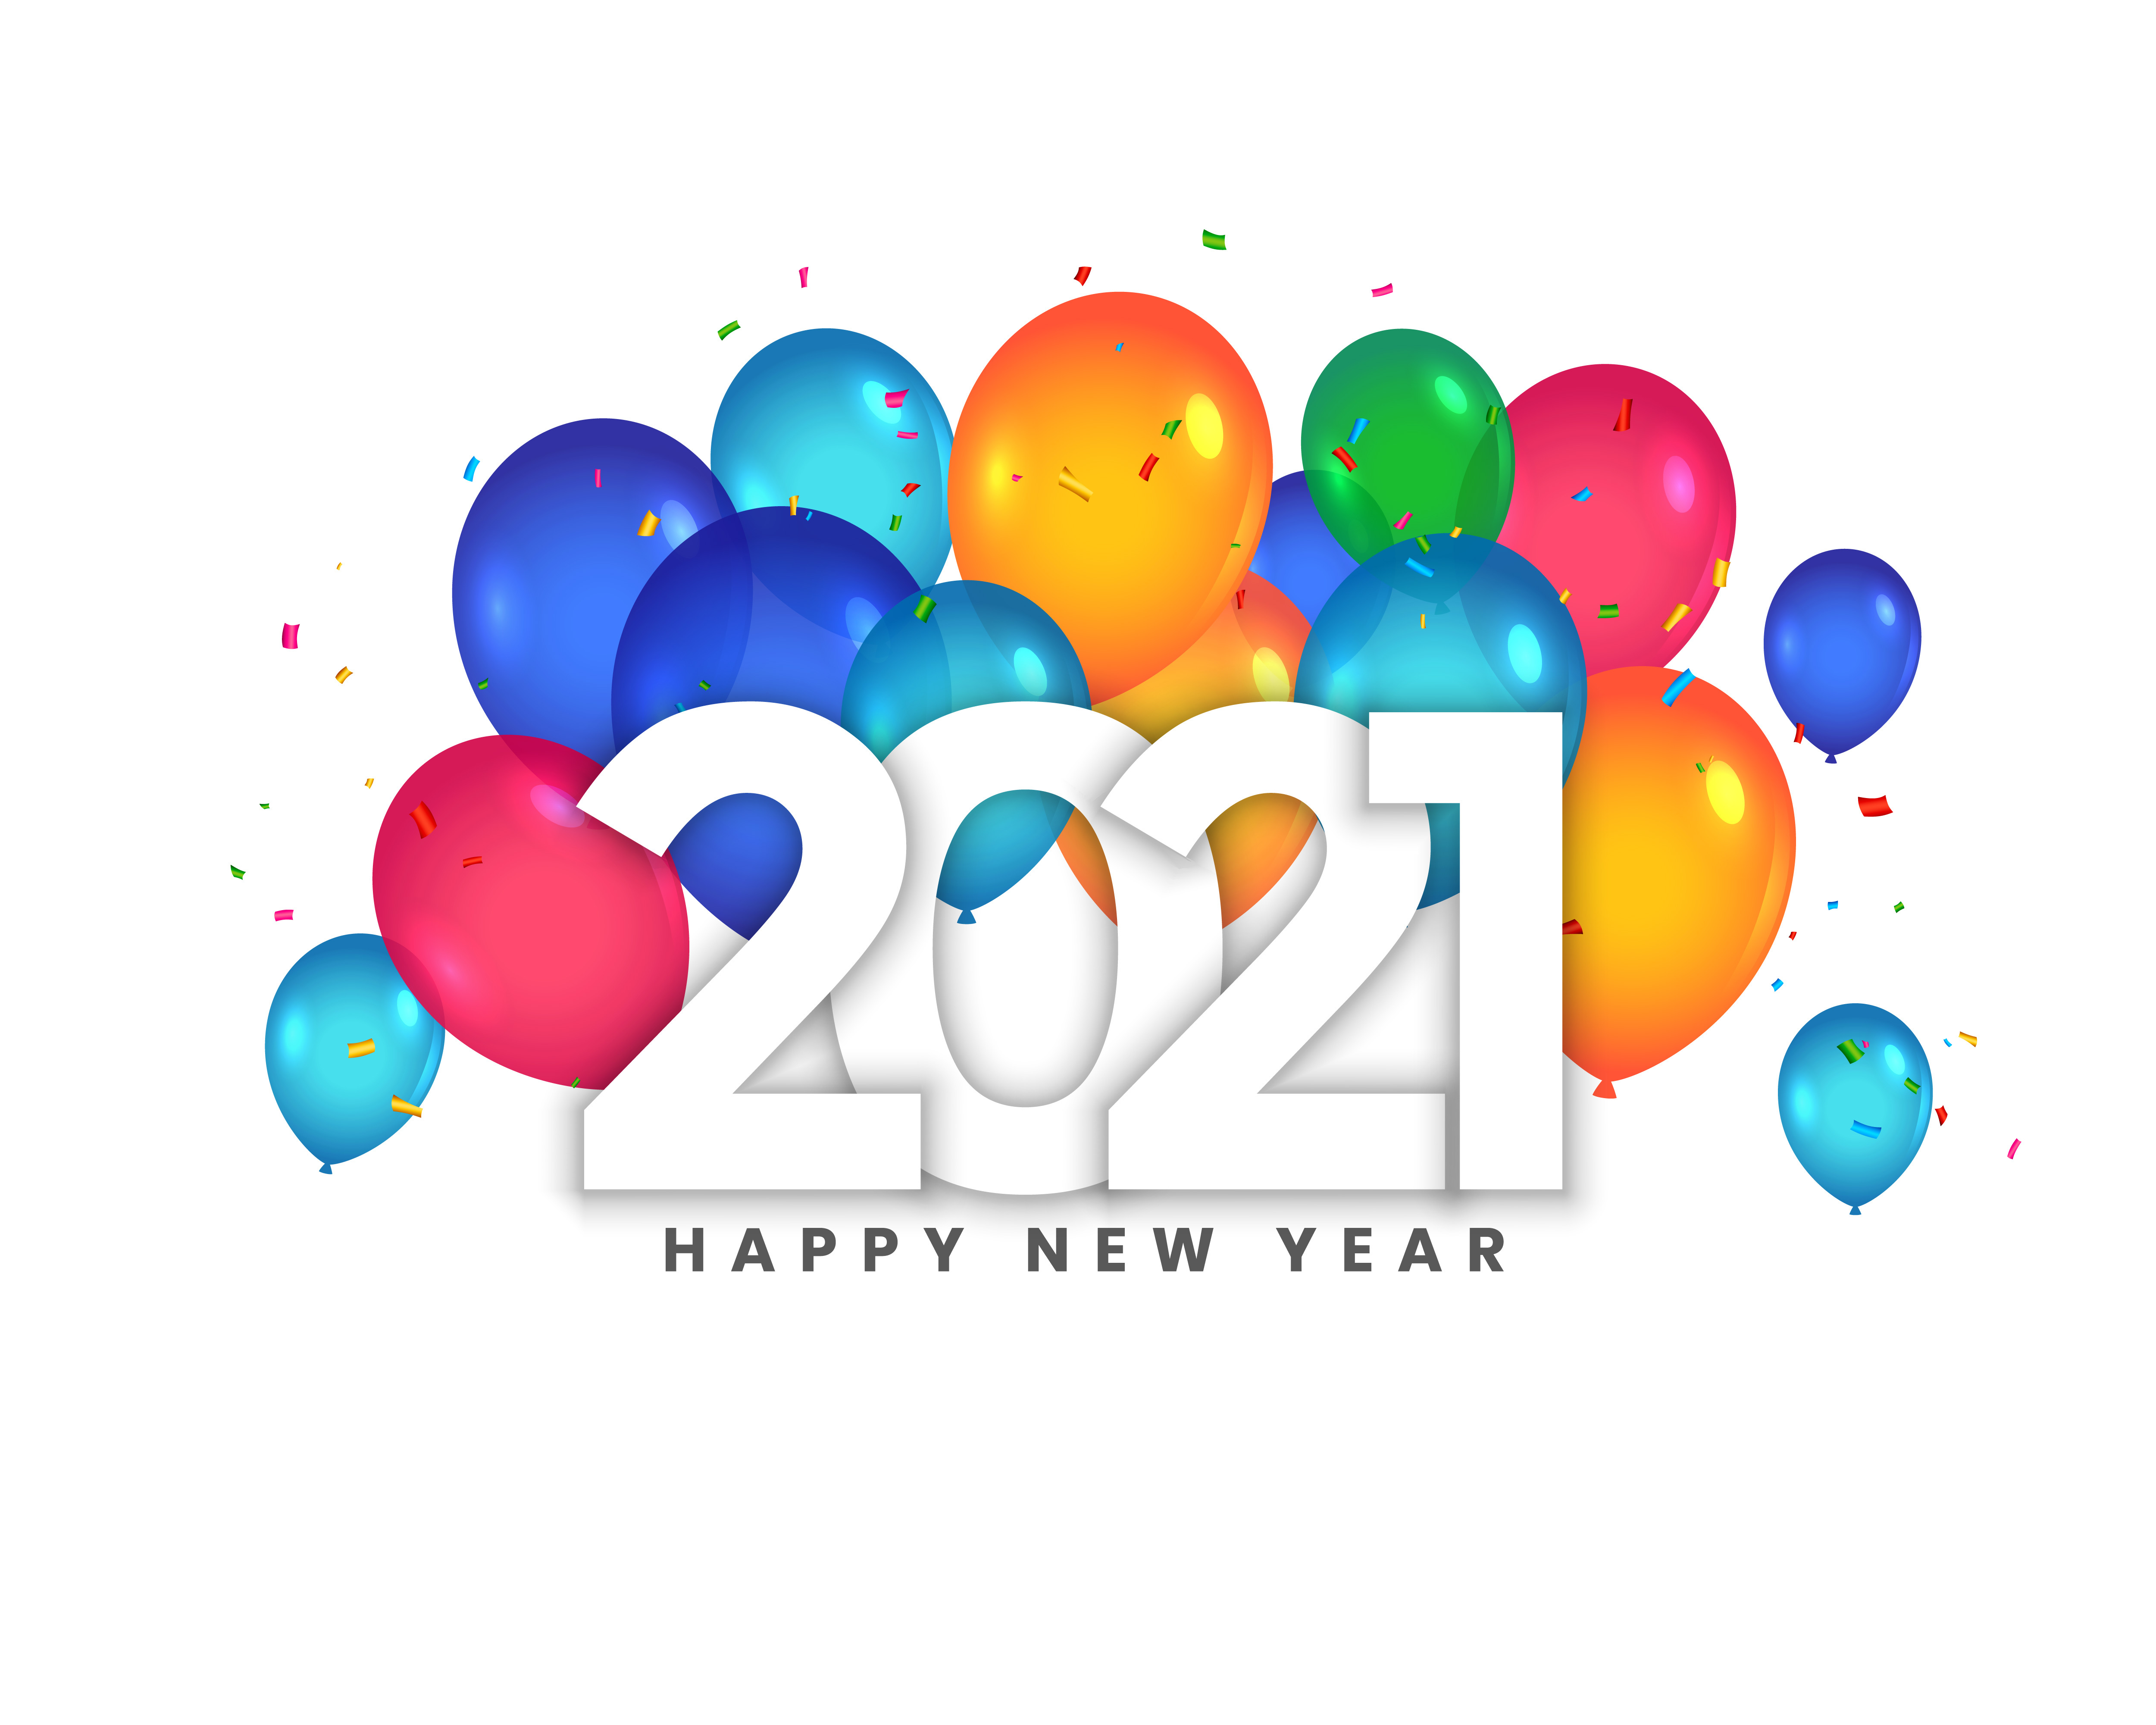 happy new year 2021 balloons celebration background design